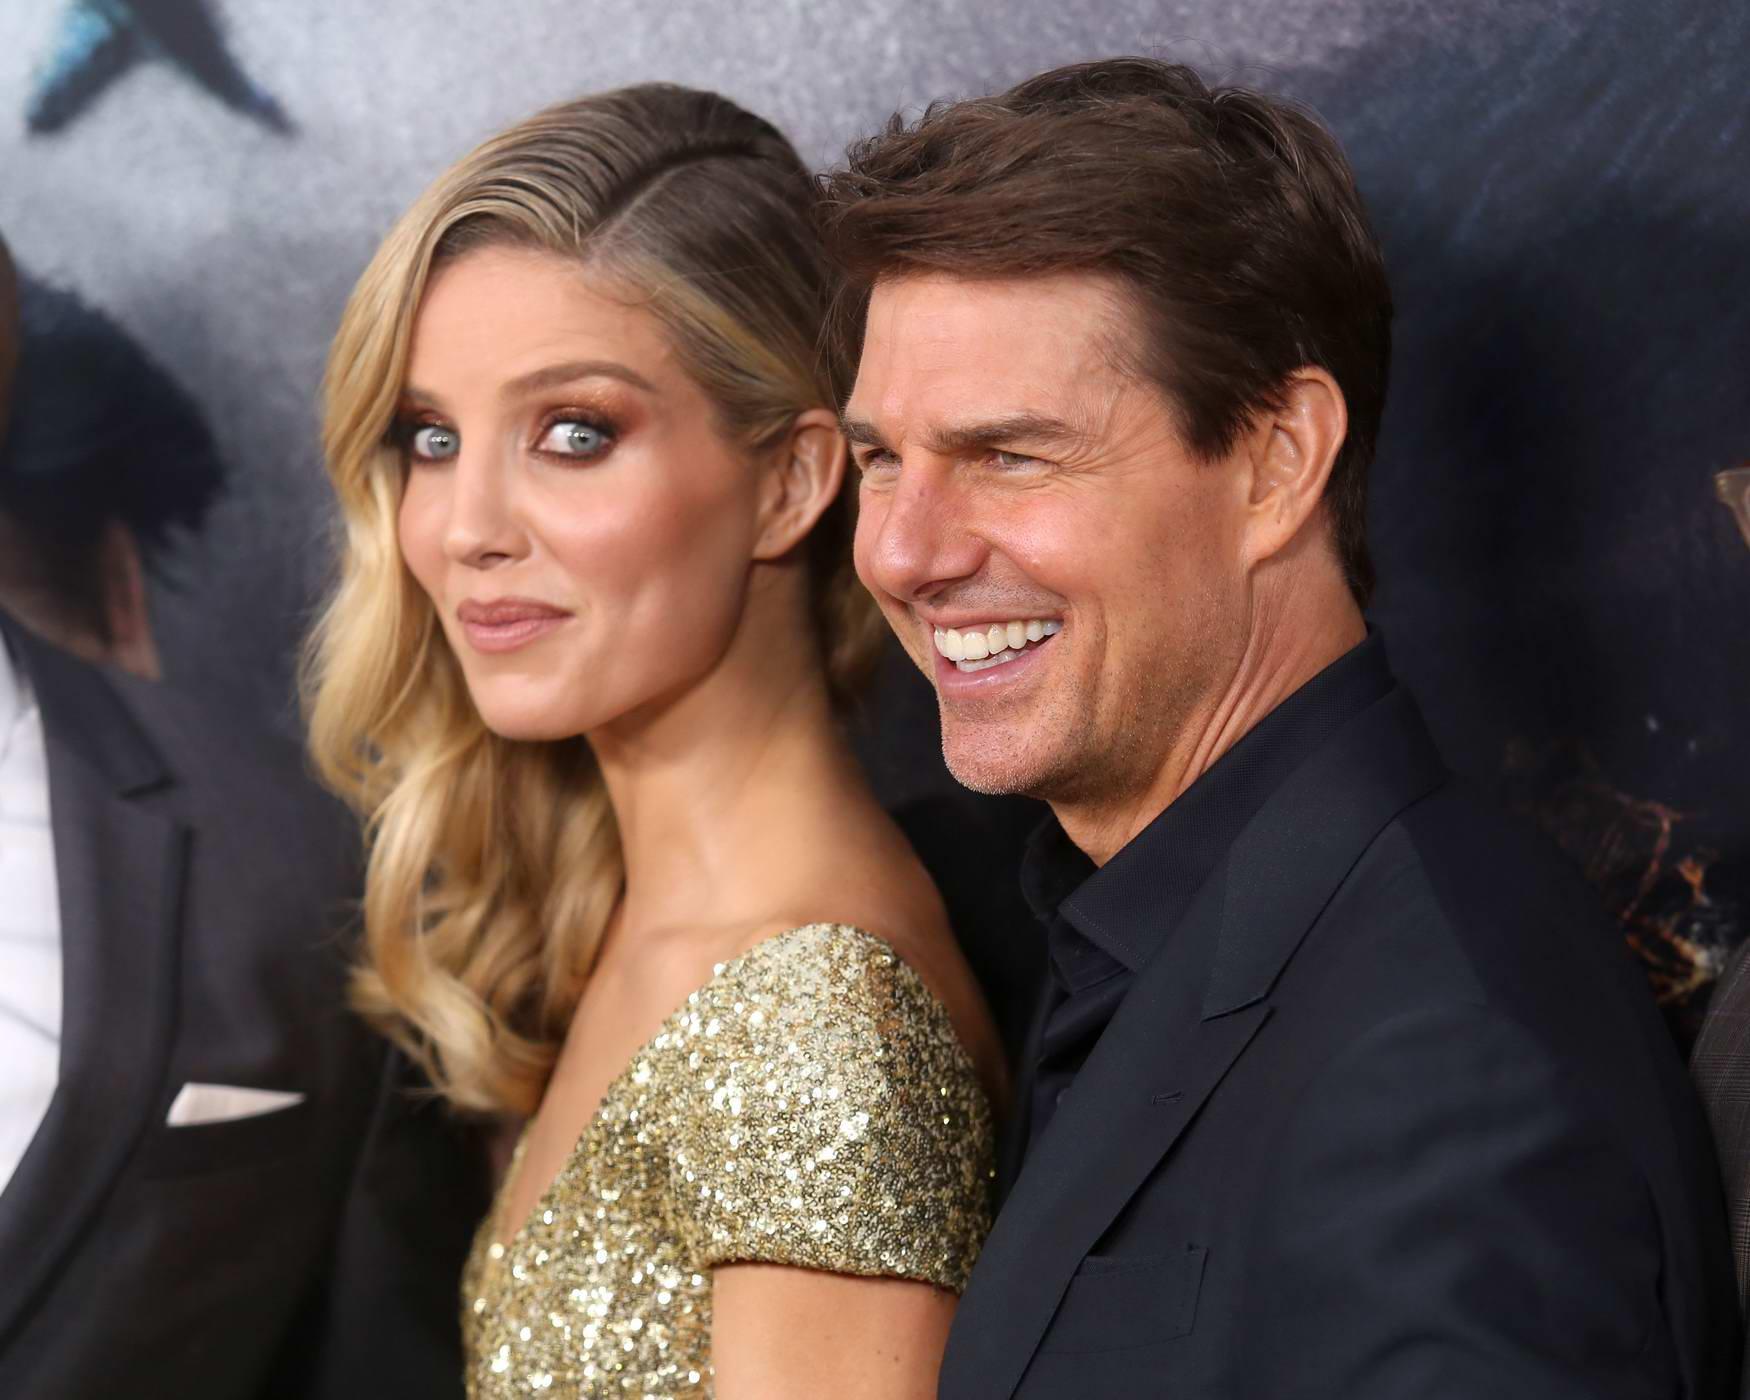 She was sharing how she made Tom Cruise run.